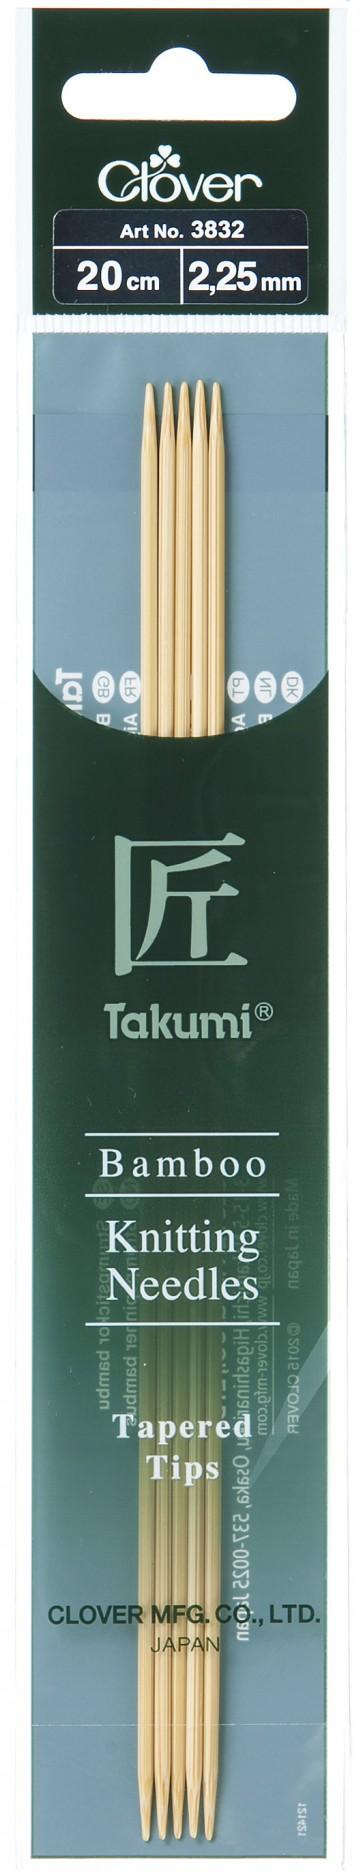 CLOVER Strumpfstrickndl Bambus Takumi 20cm/2.25mm